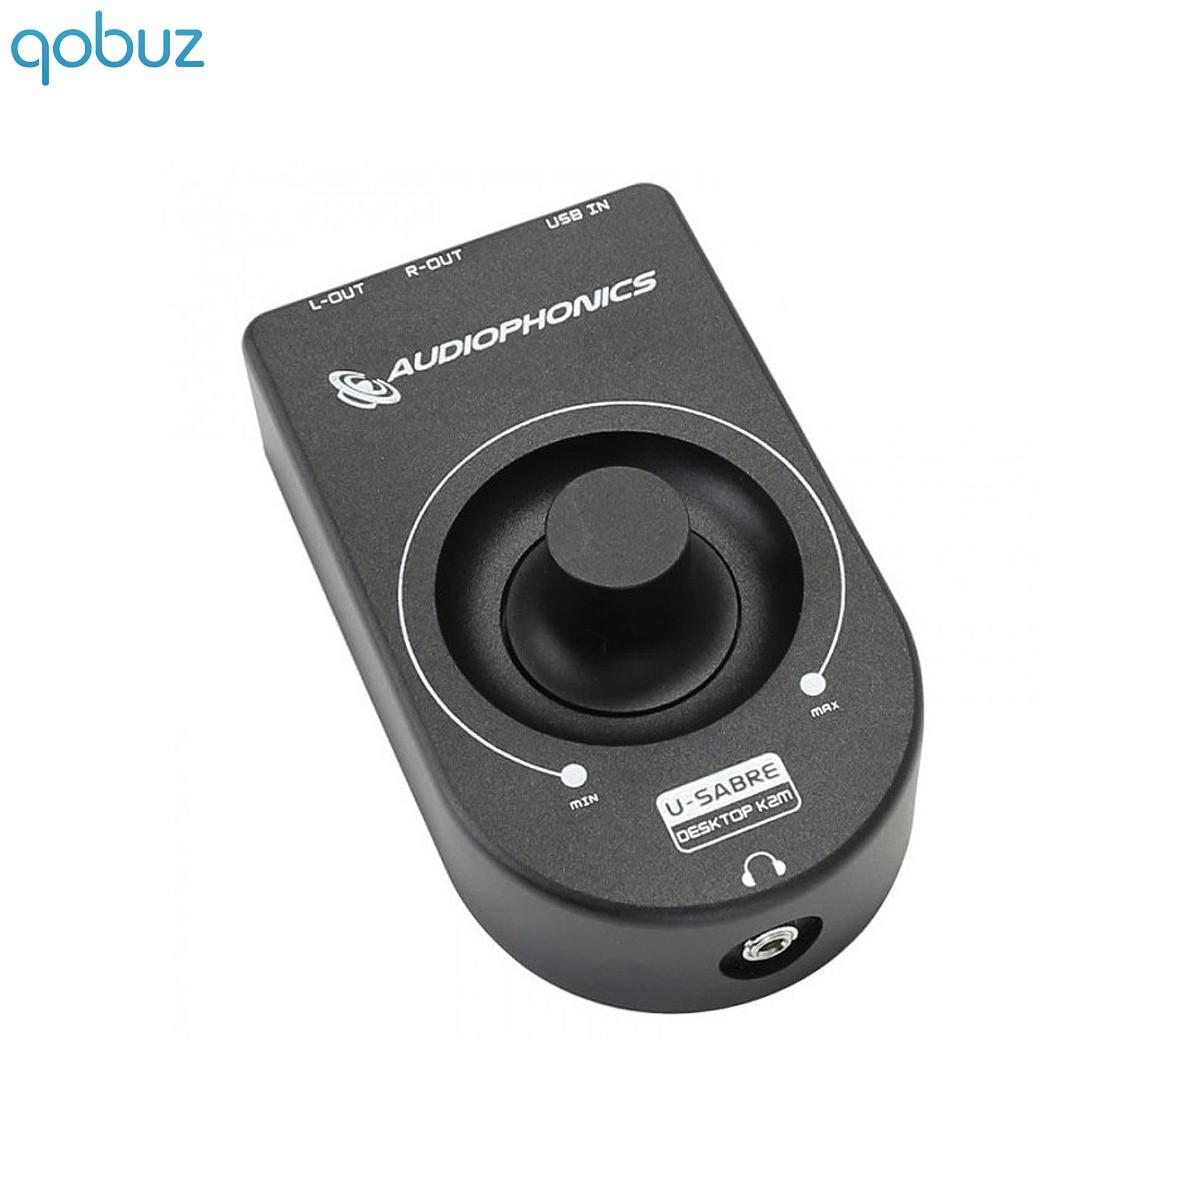 AUDIOPHONICS U-Sabre Desktop K2M DAC / Headphone Ampli 24bit/96kHz SA9023 / ES9018